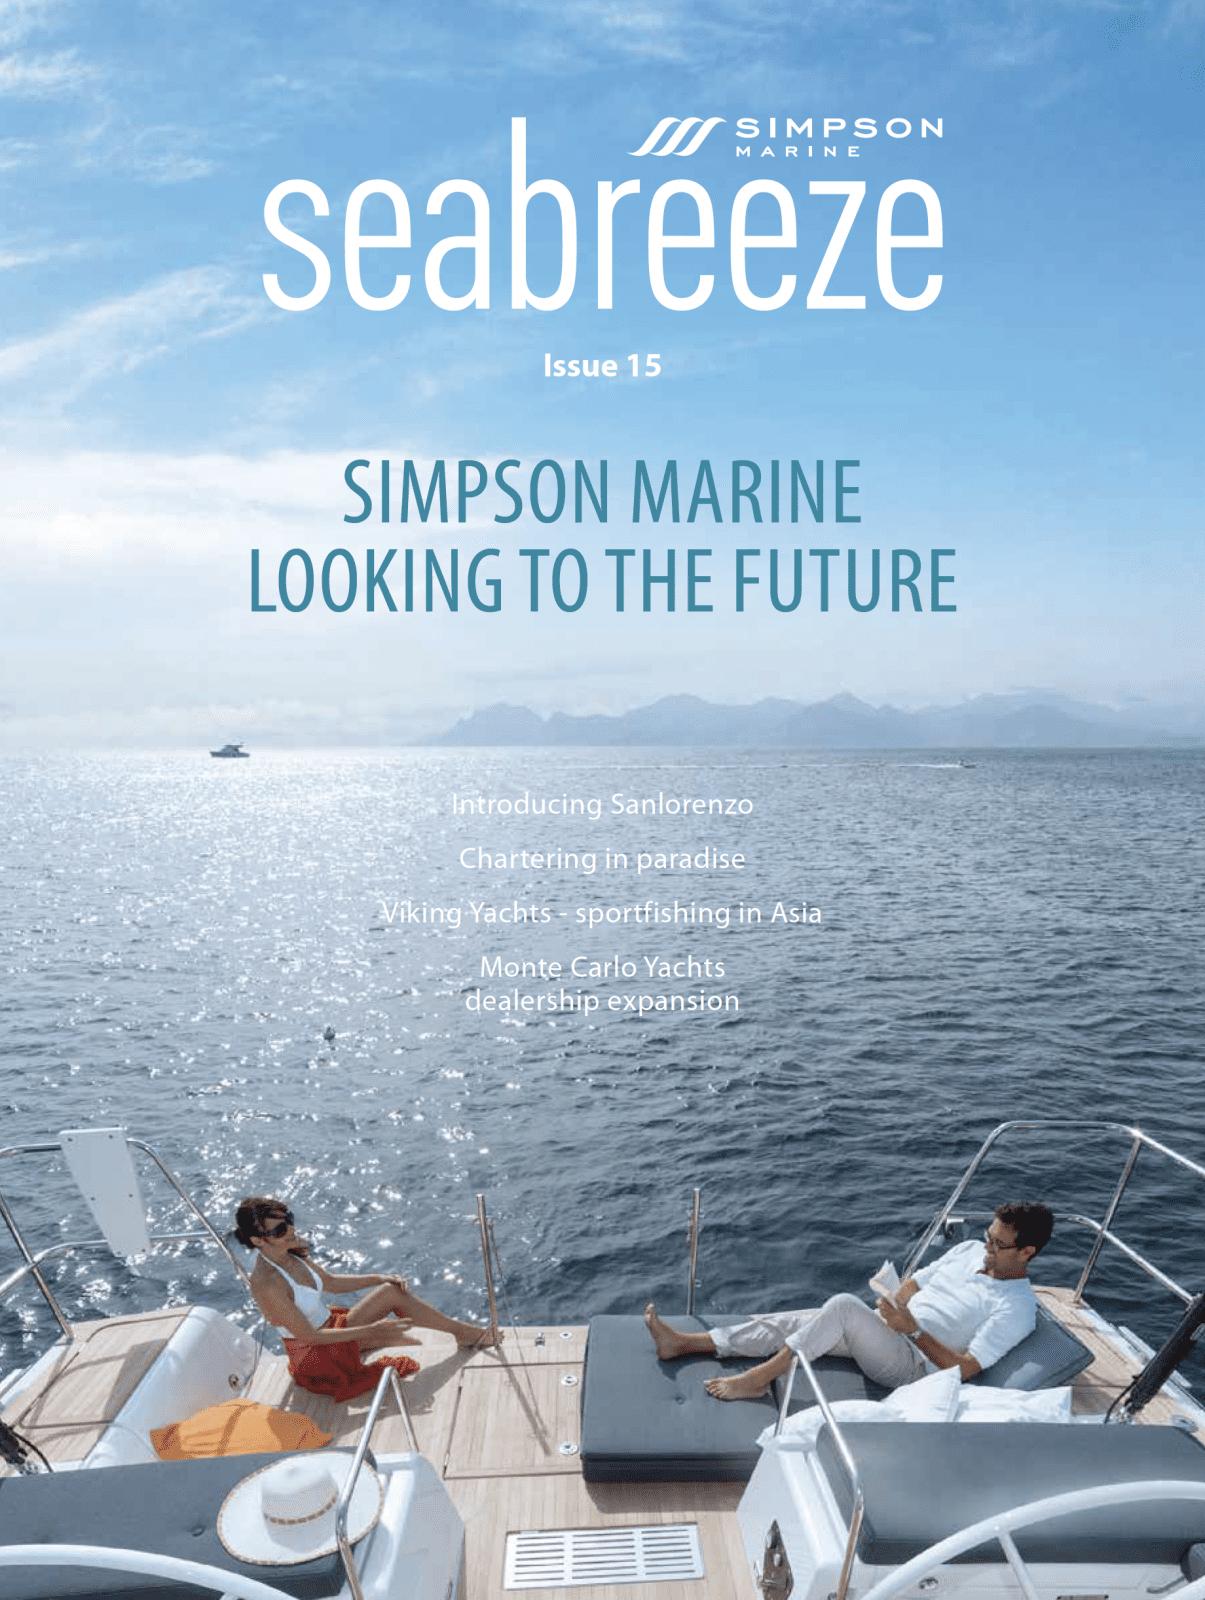 Simpson Marine - Issue 2015/2016